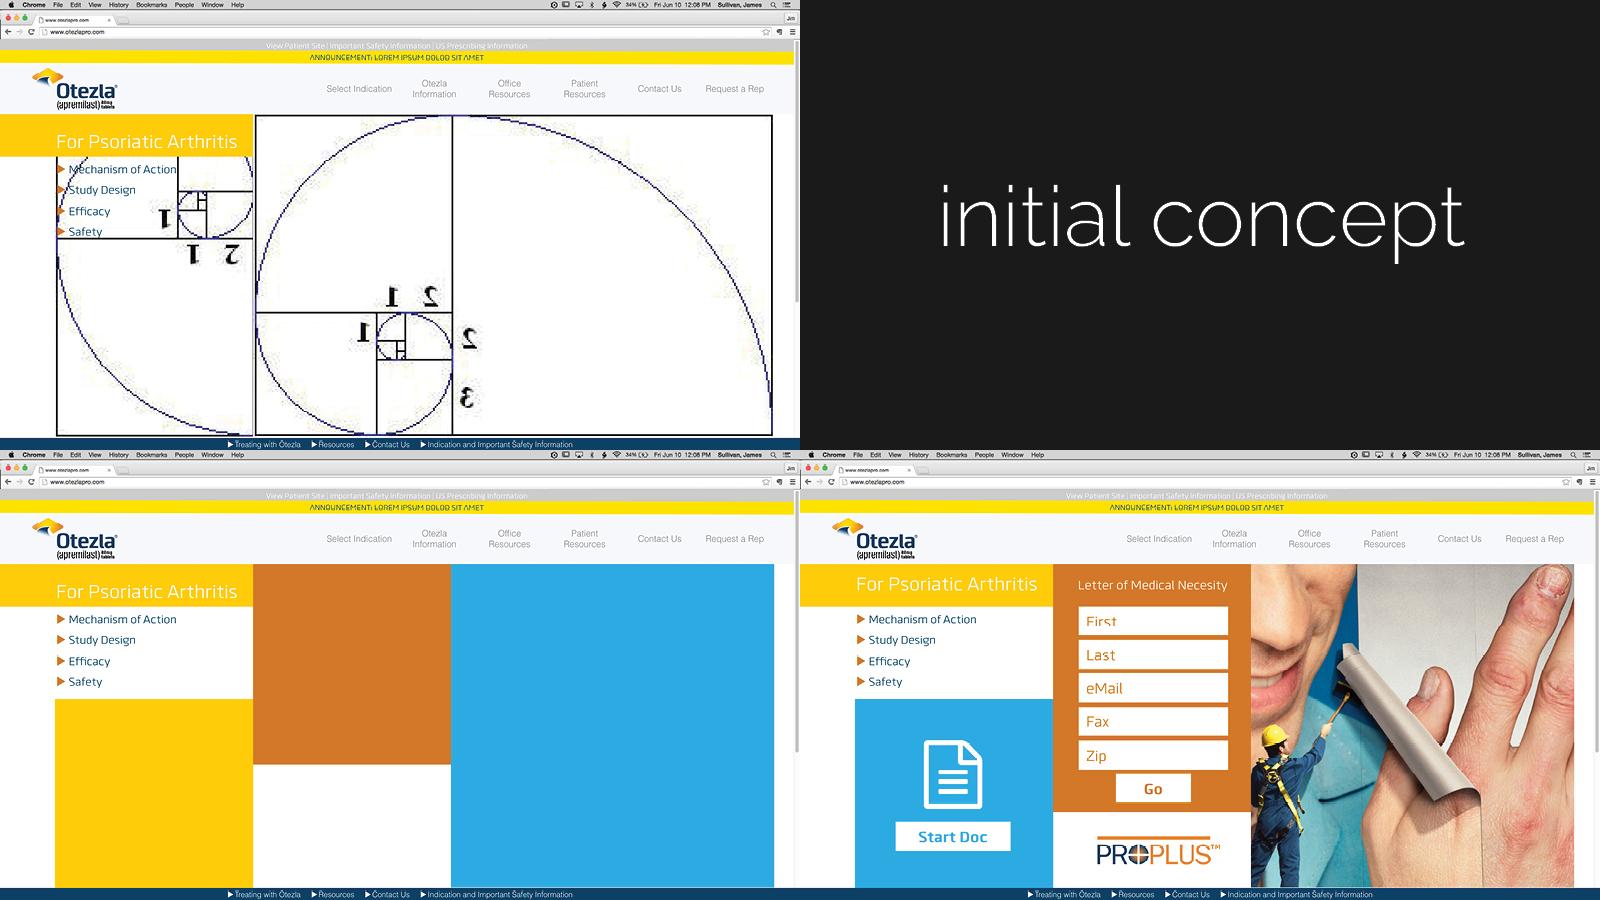 Otezla Web Concept Page 11 1667x938x75